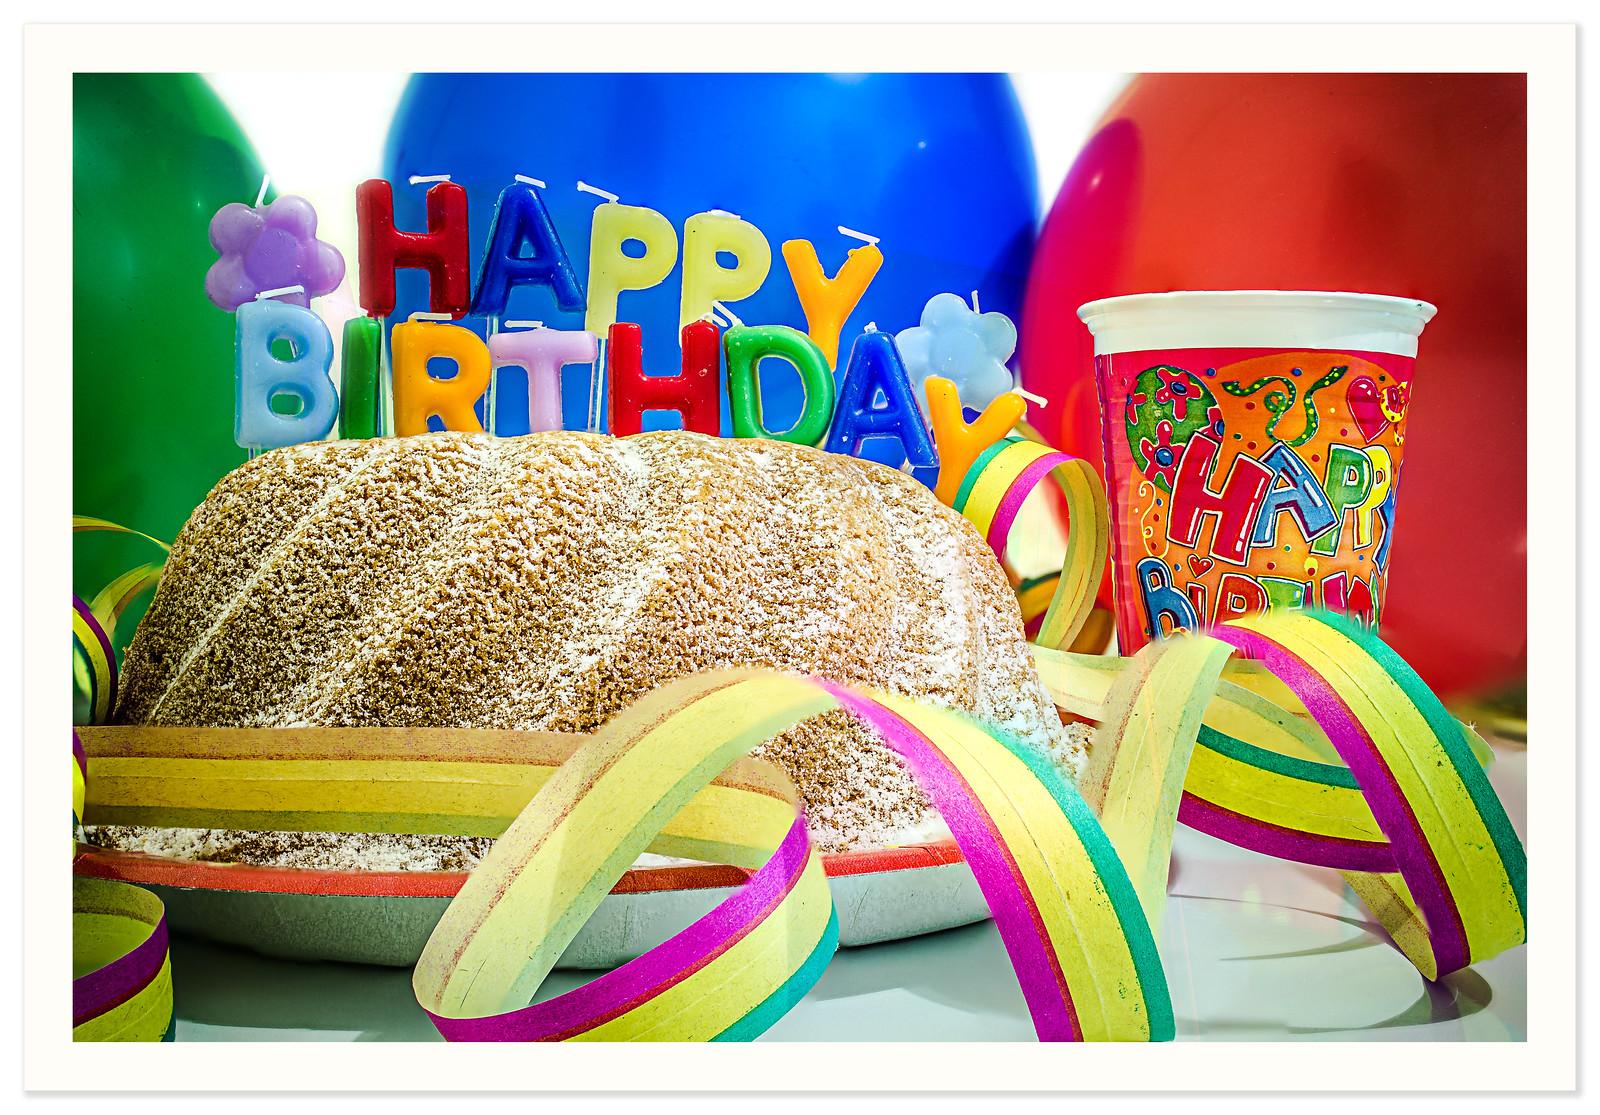 21.03.2013: Happy Birthday!